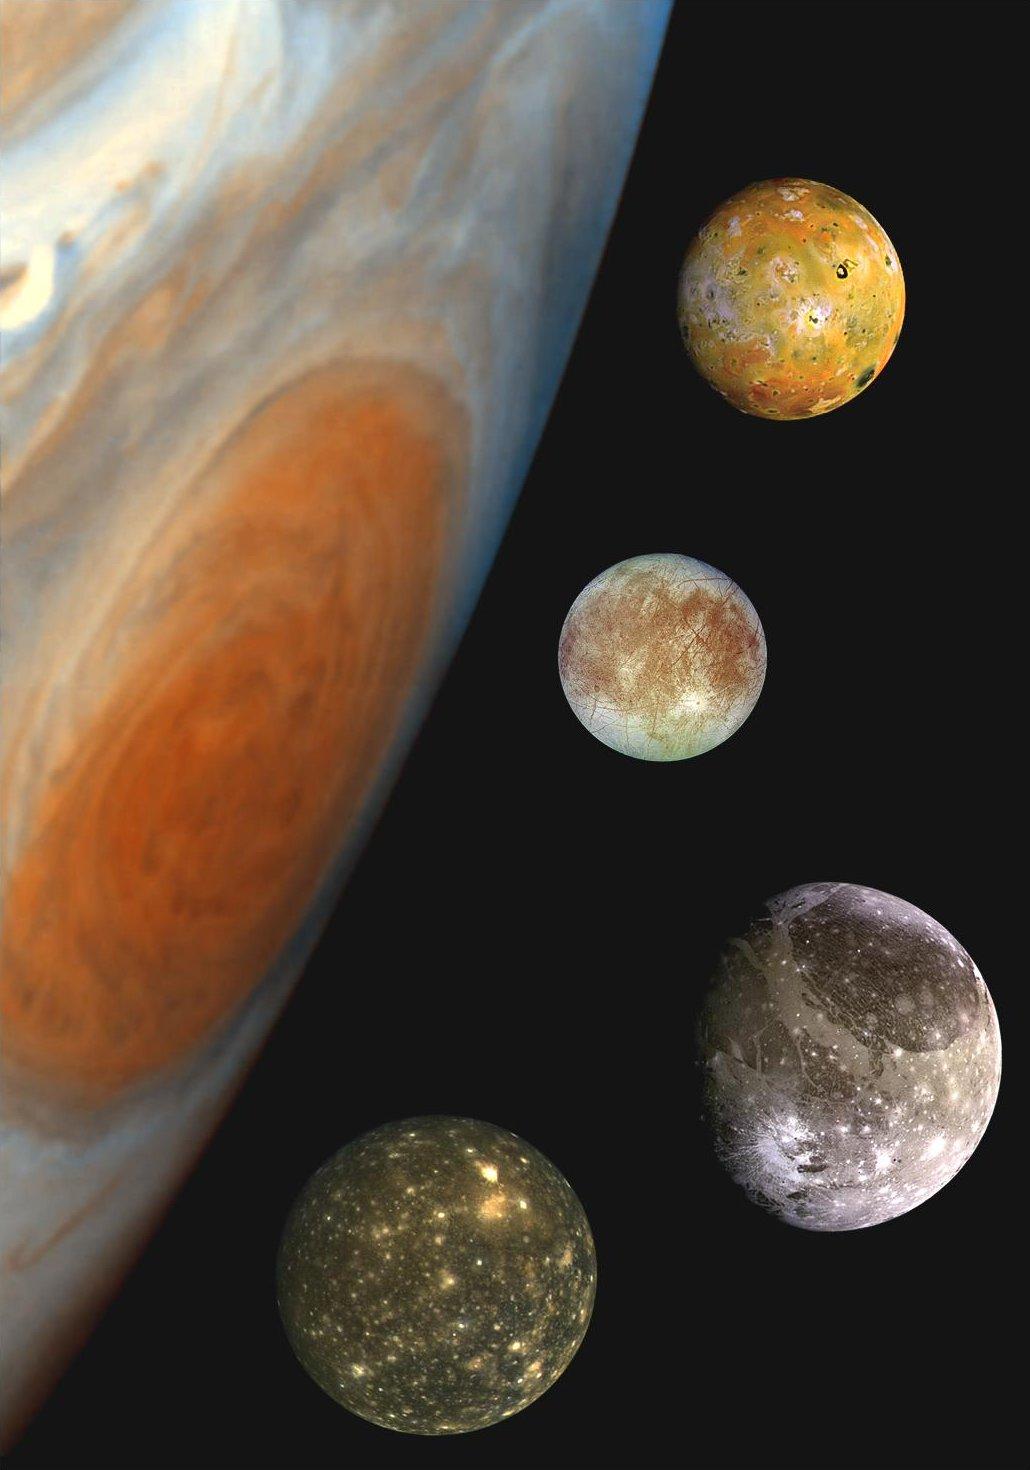 Copyright November 1997 NASA/JPL/DLR.